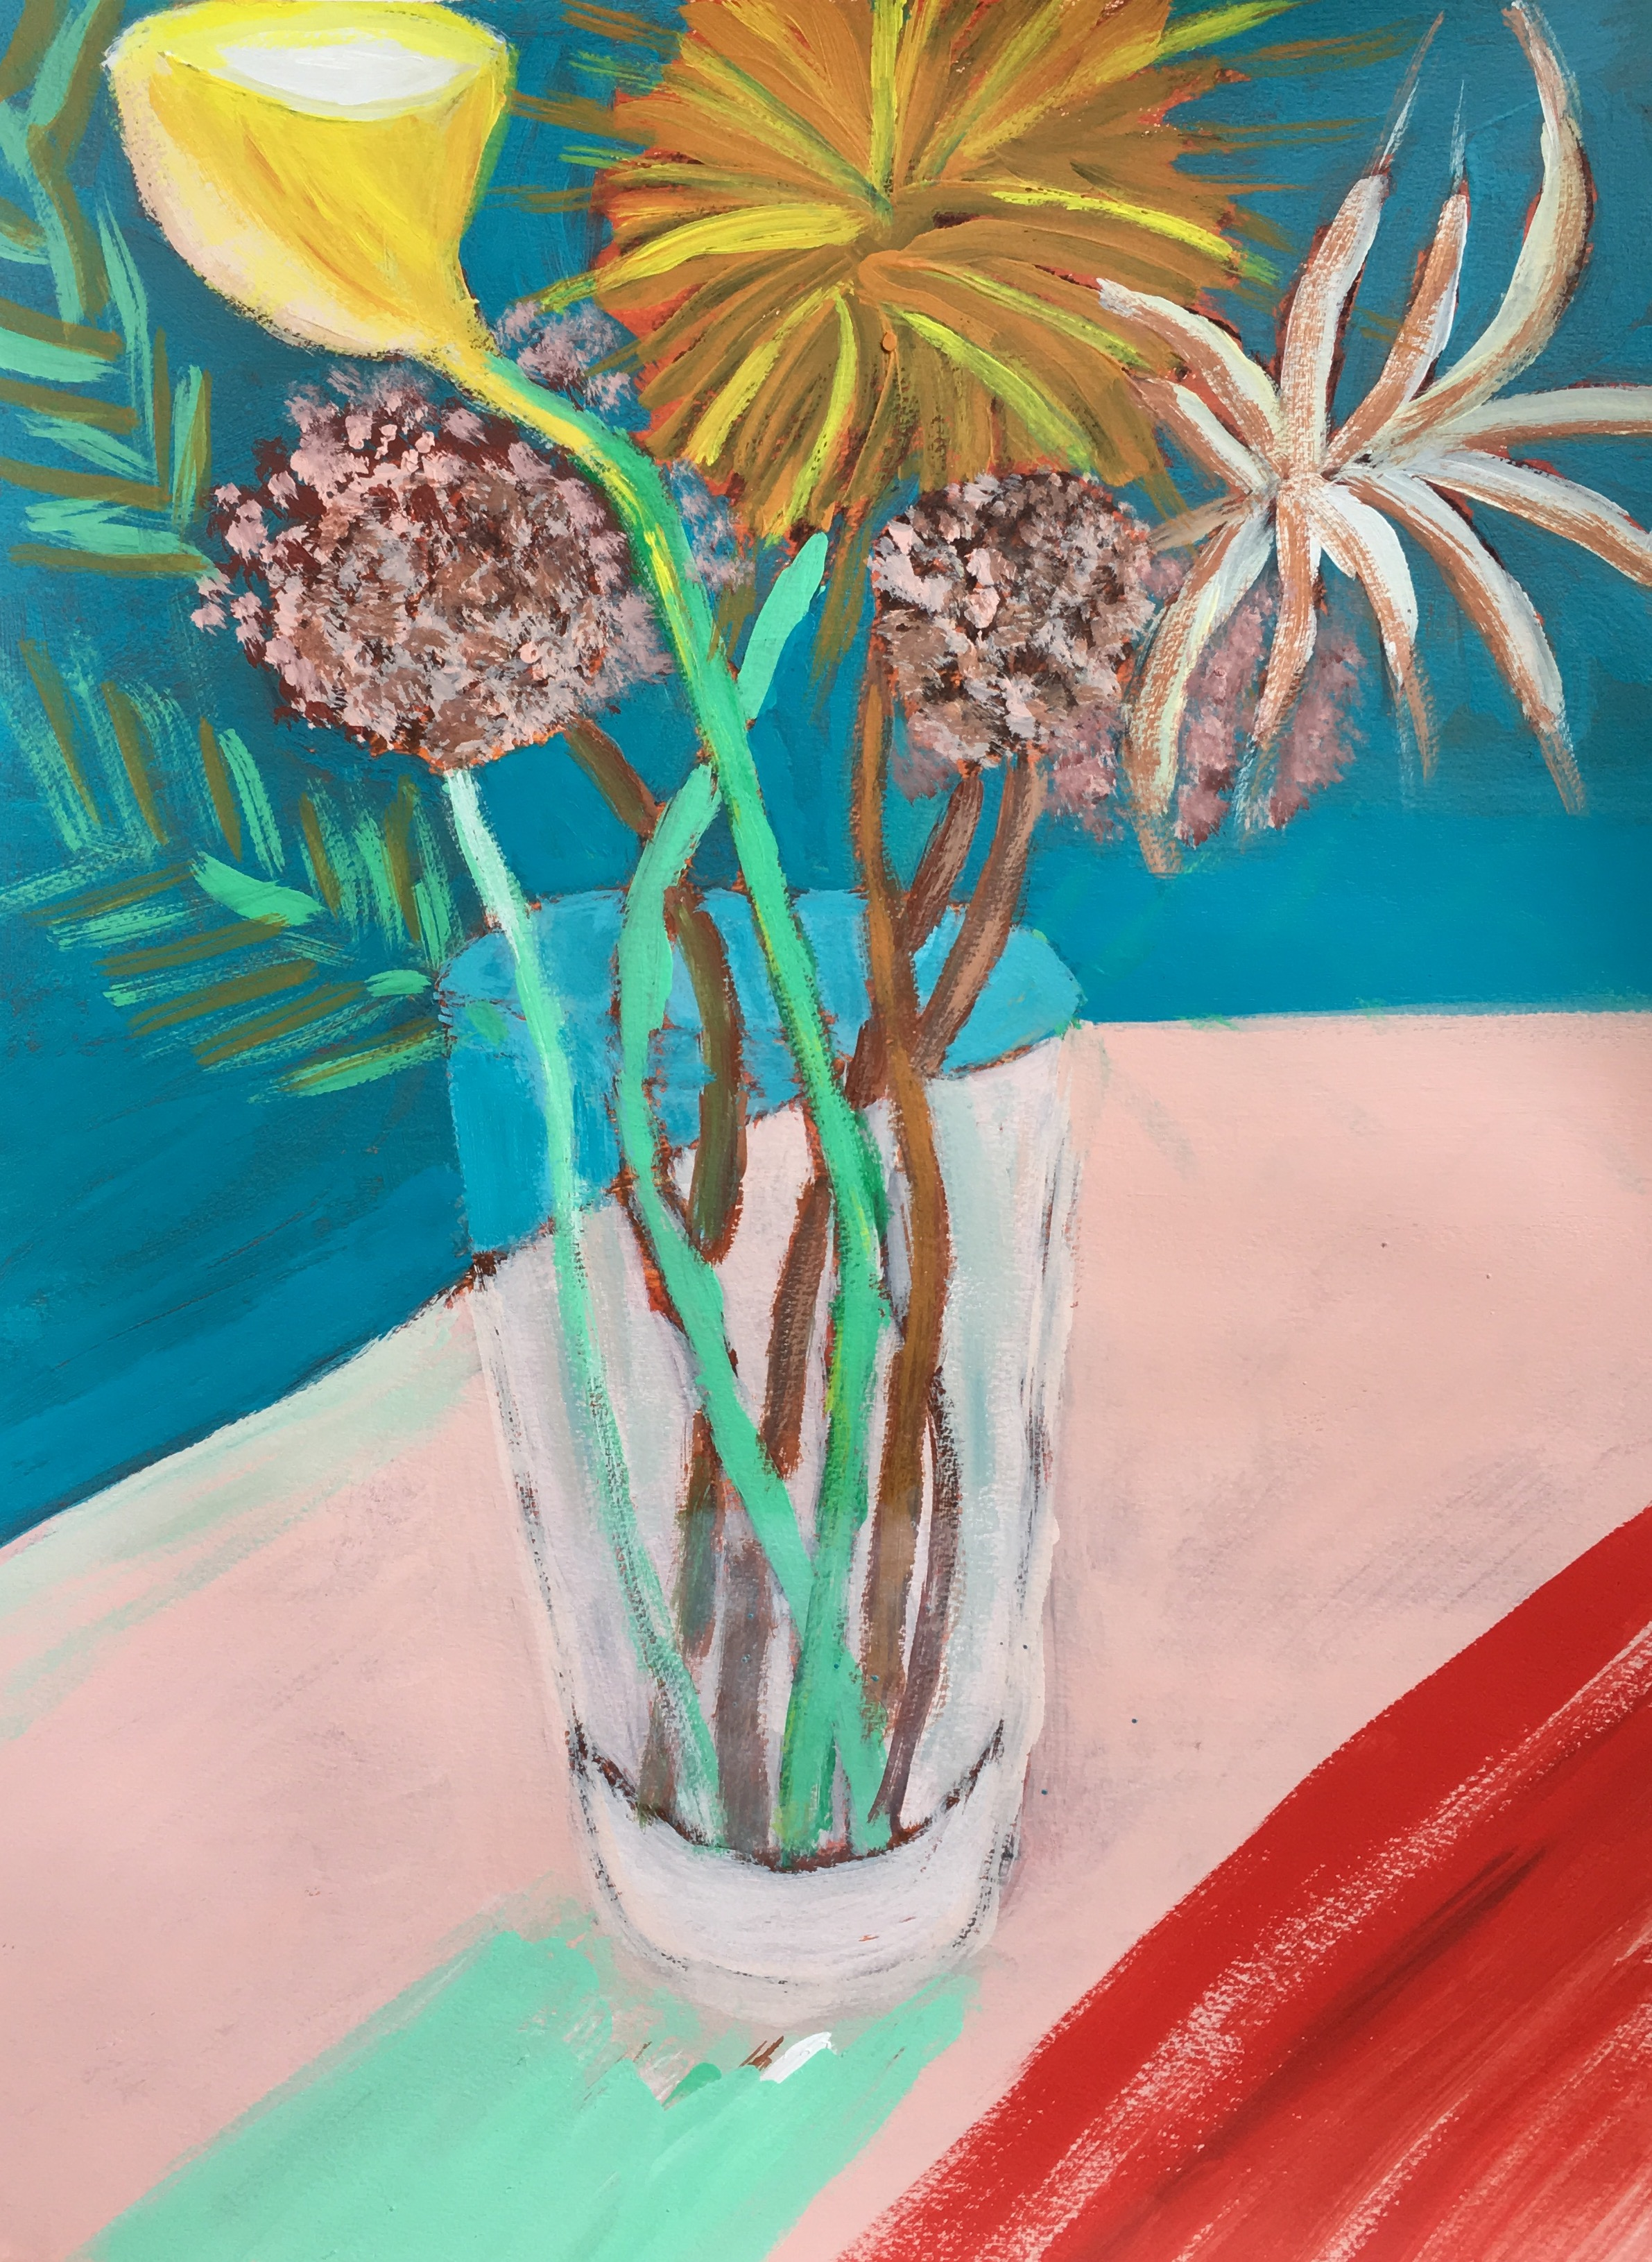 """It's Still Life"" Acrylic On Paper 24x18"